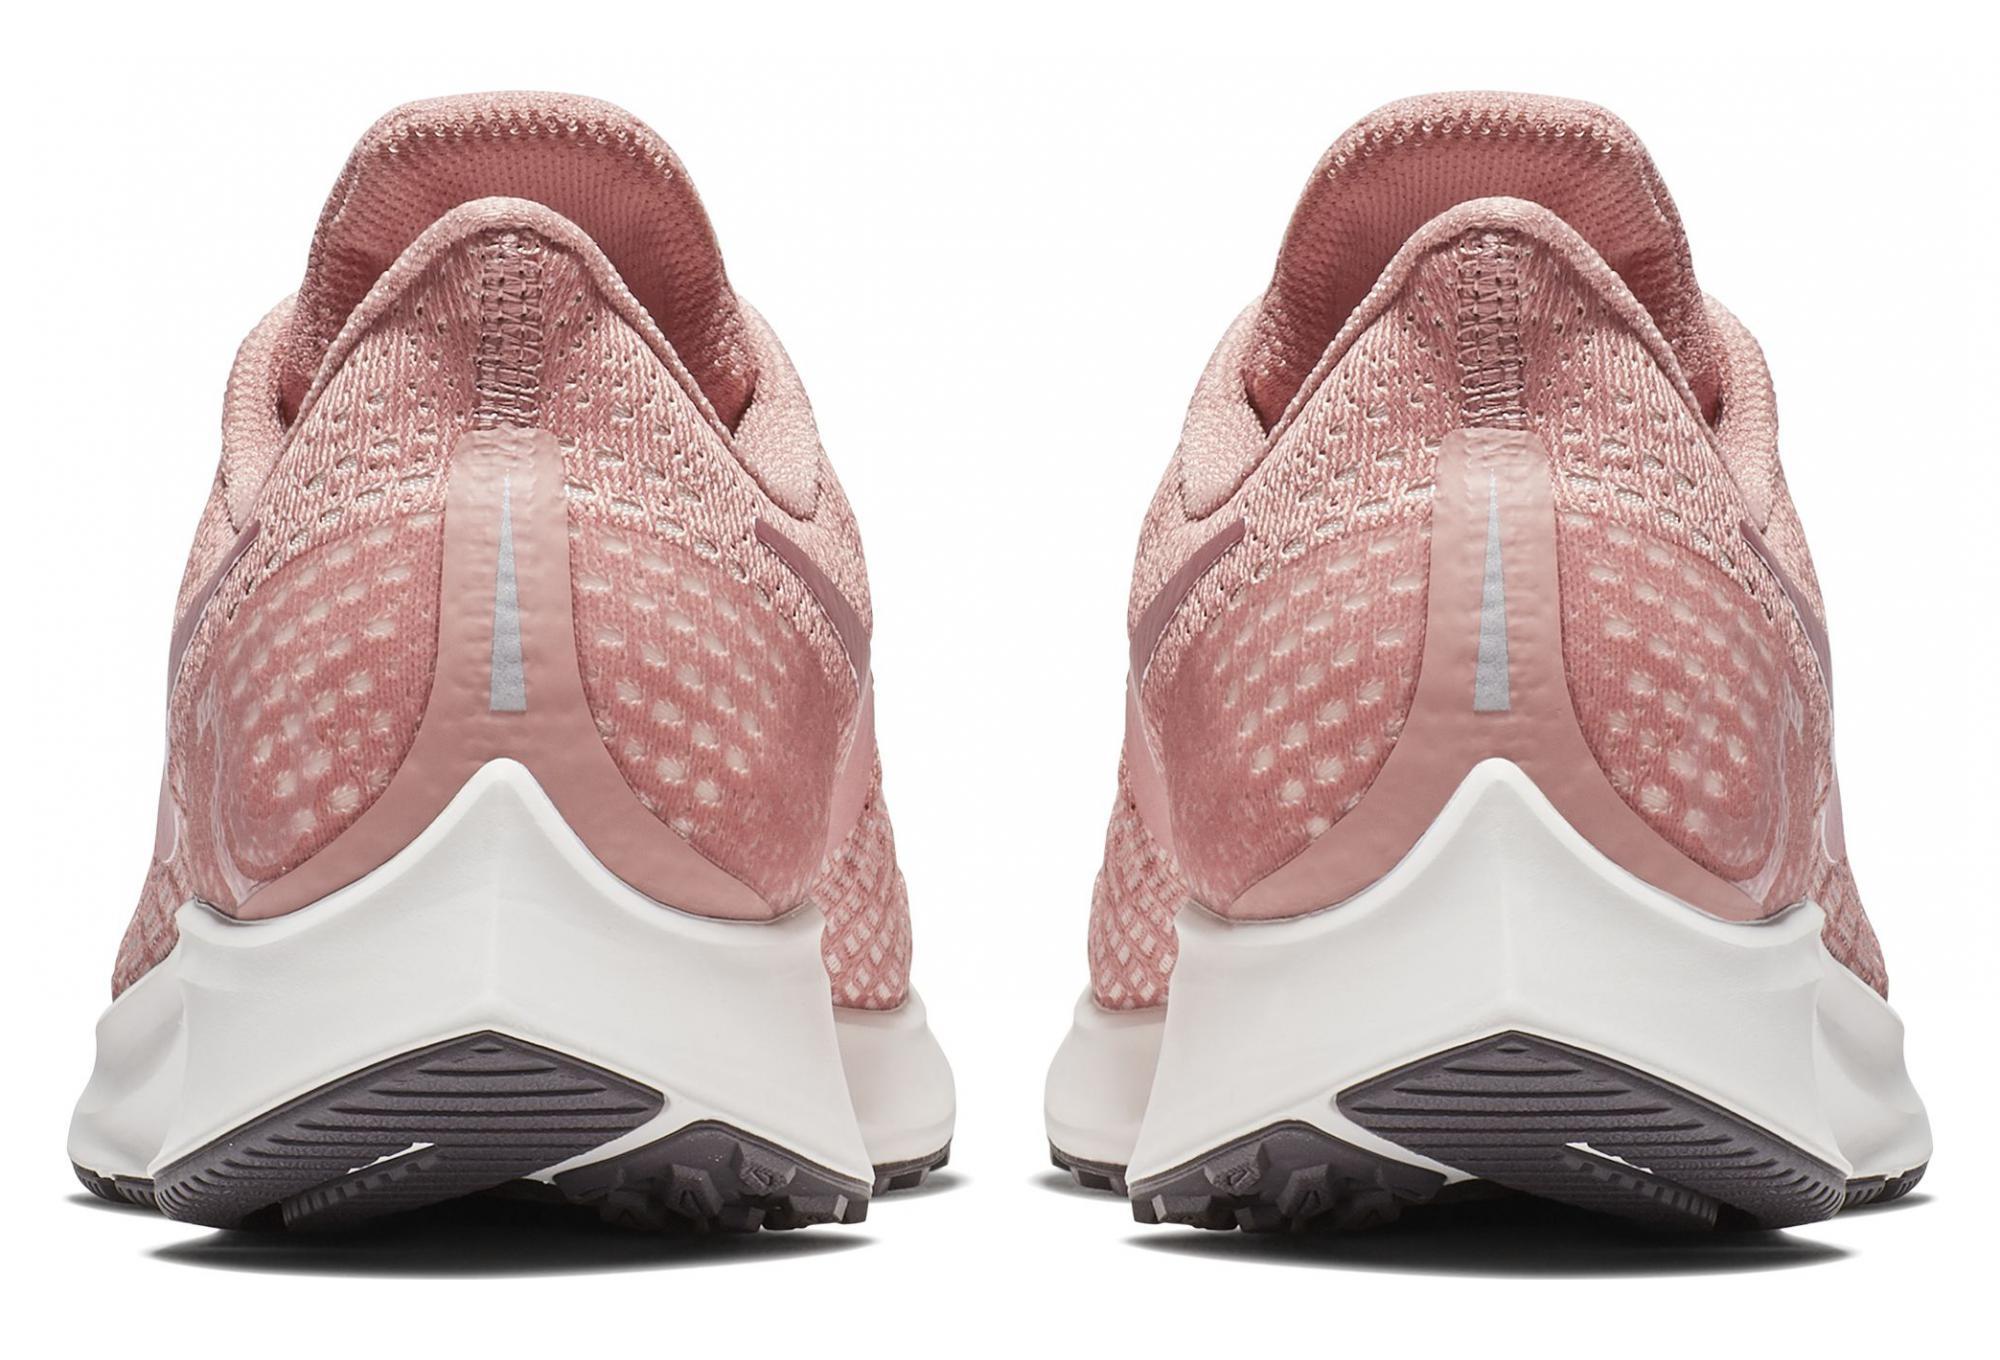 new arrivals df9e9 505c9 Chaussures de Running Femme Nike Air Zoom Pegasus 35 Rose